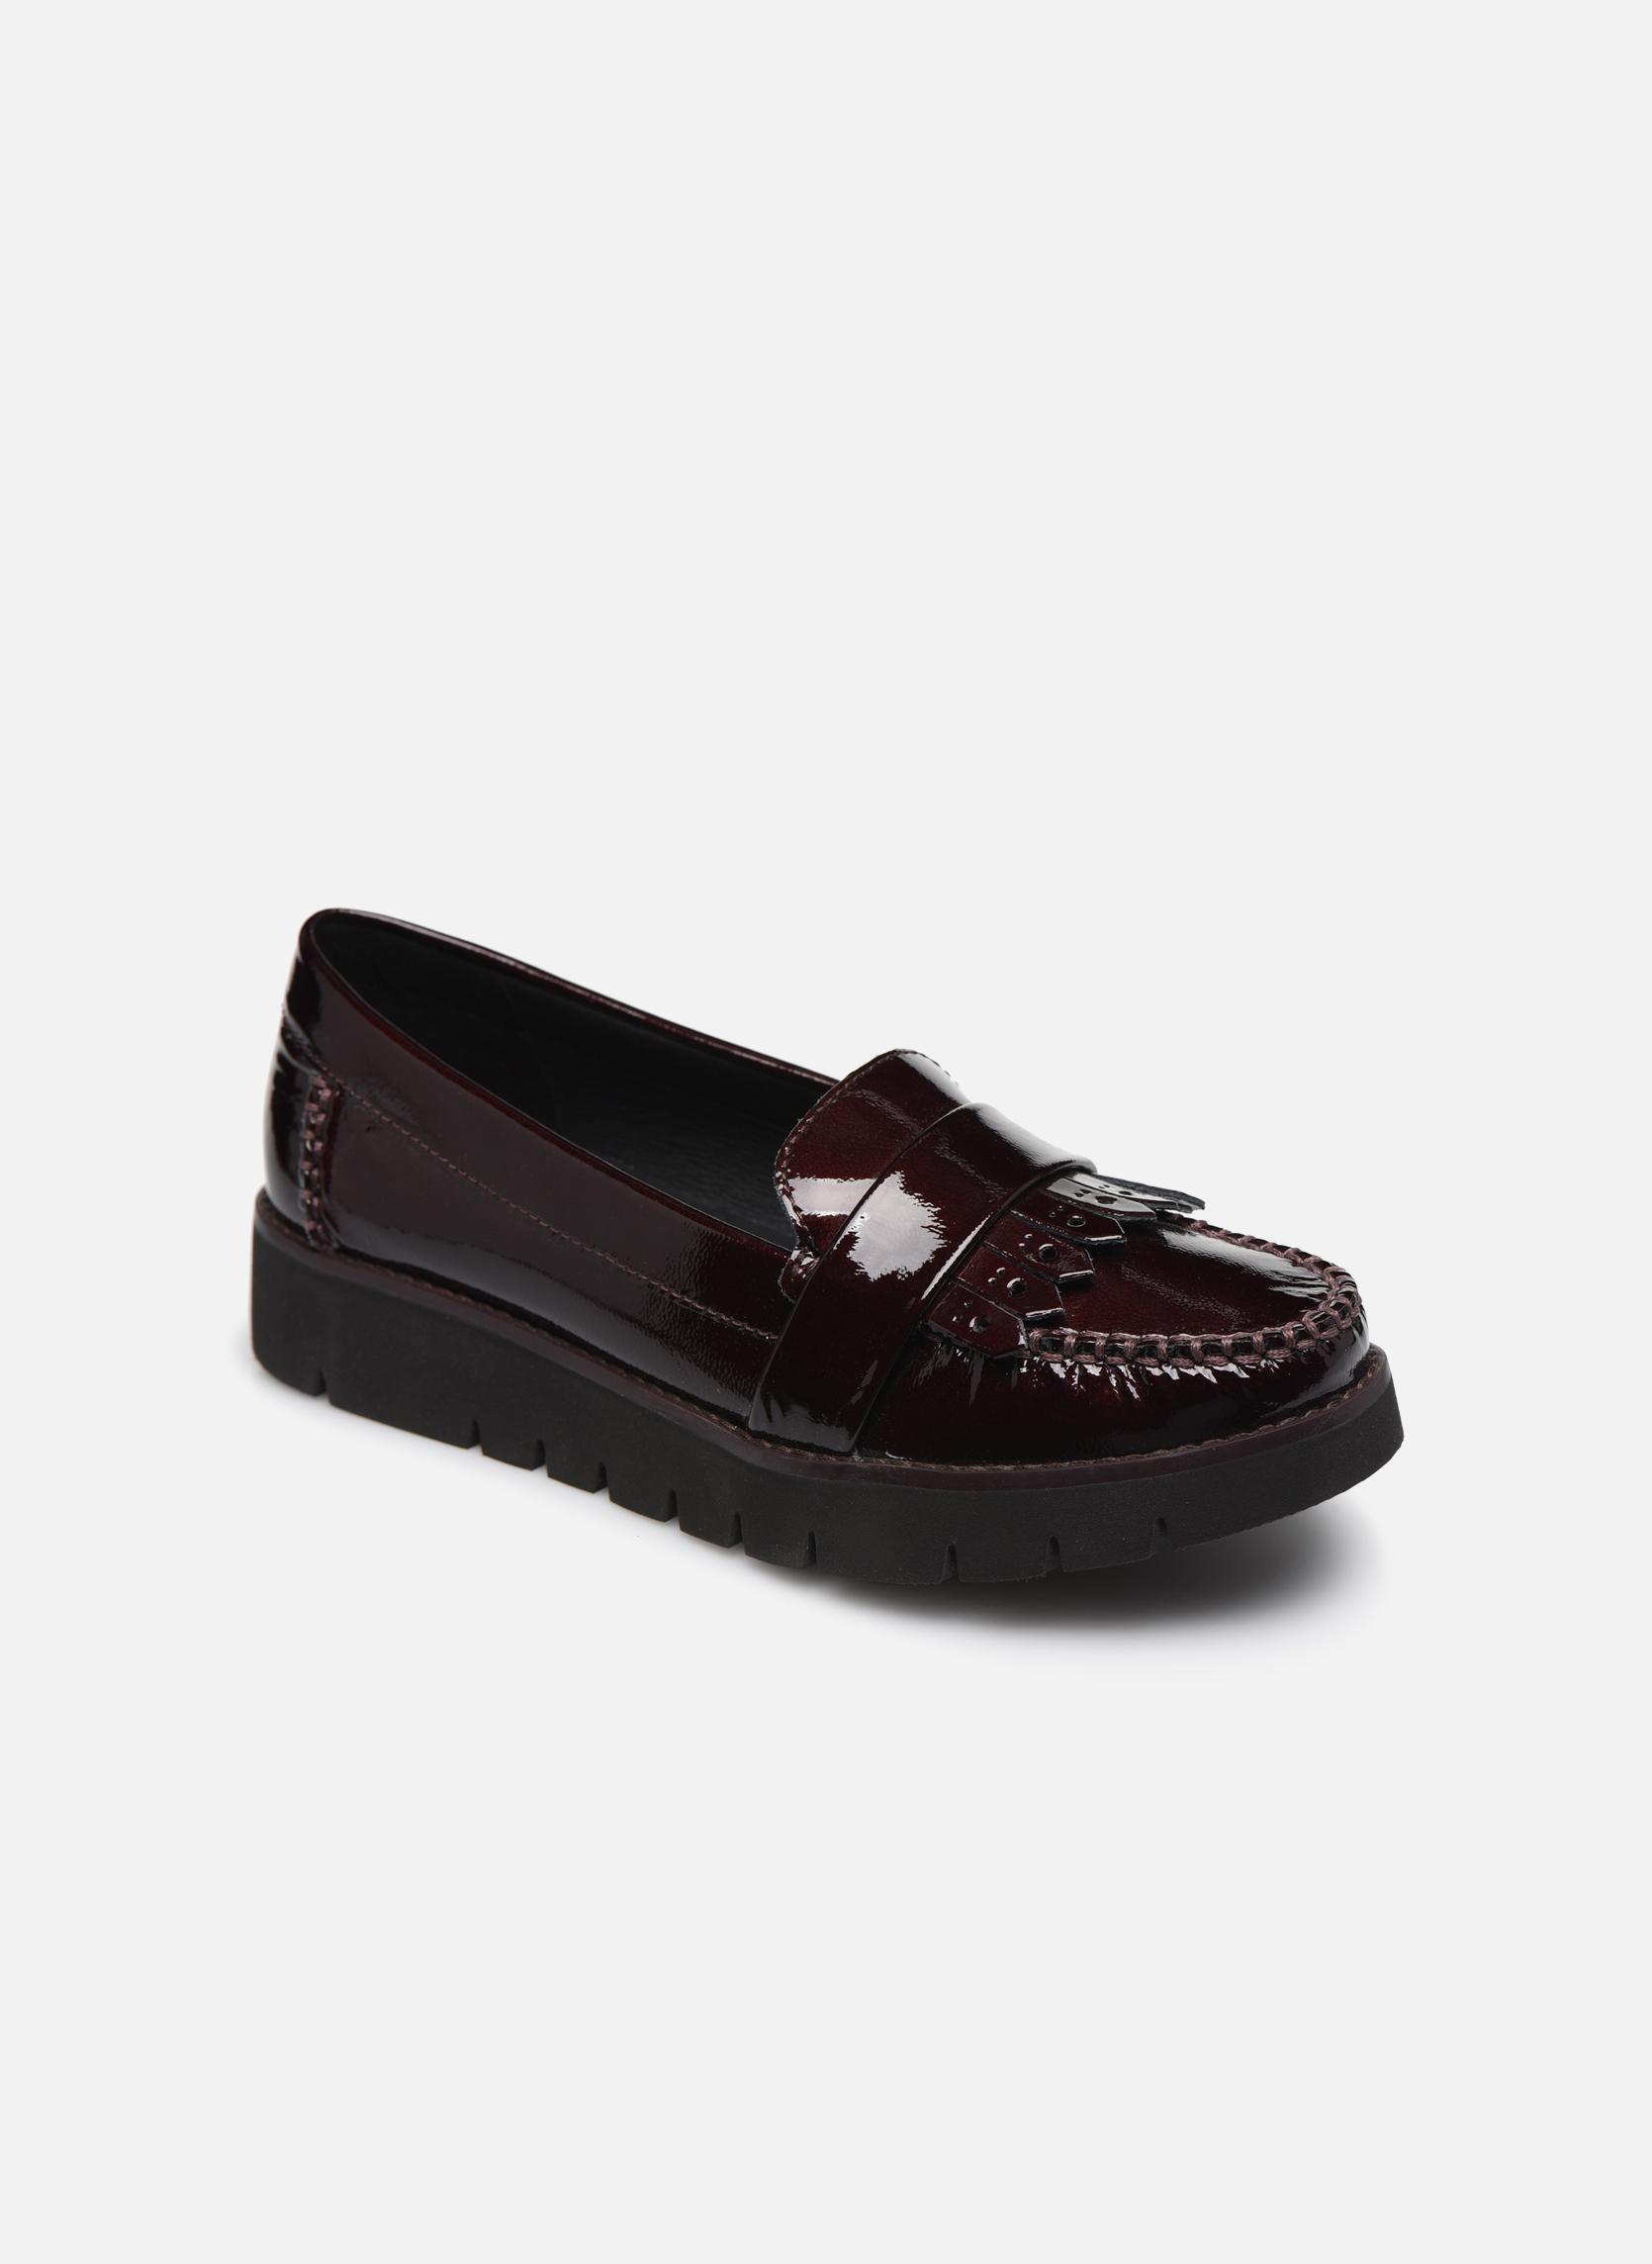 gran selección de 20ccf 2ff91 10 Zapatos Cómodos Wz1hyqq Mujer De Marcas SwEZIZ ...